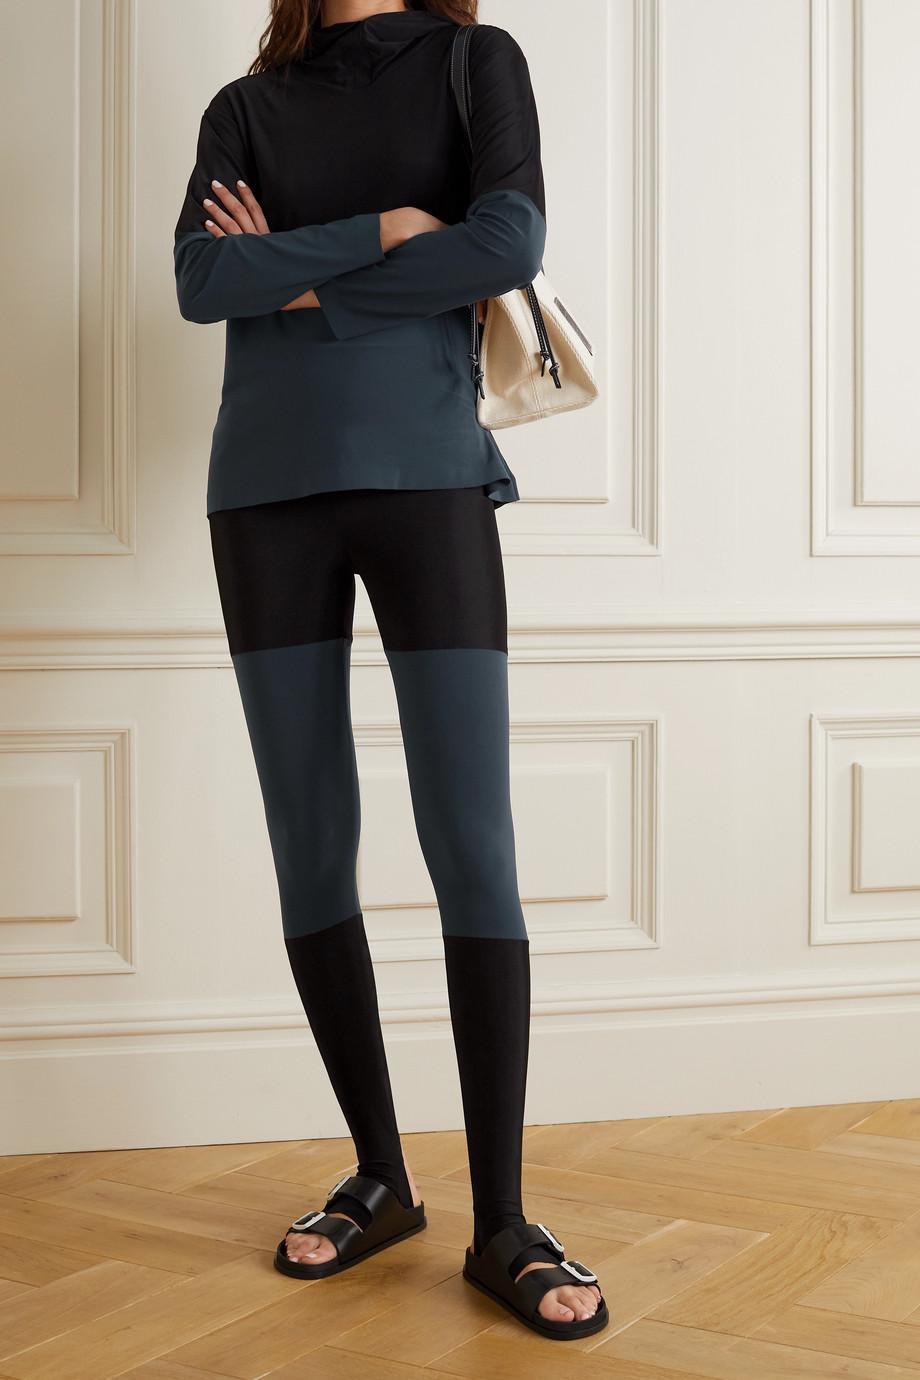 Norma Kamali Two-tone stretch-jersey stirrup leggings